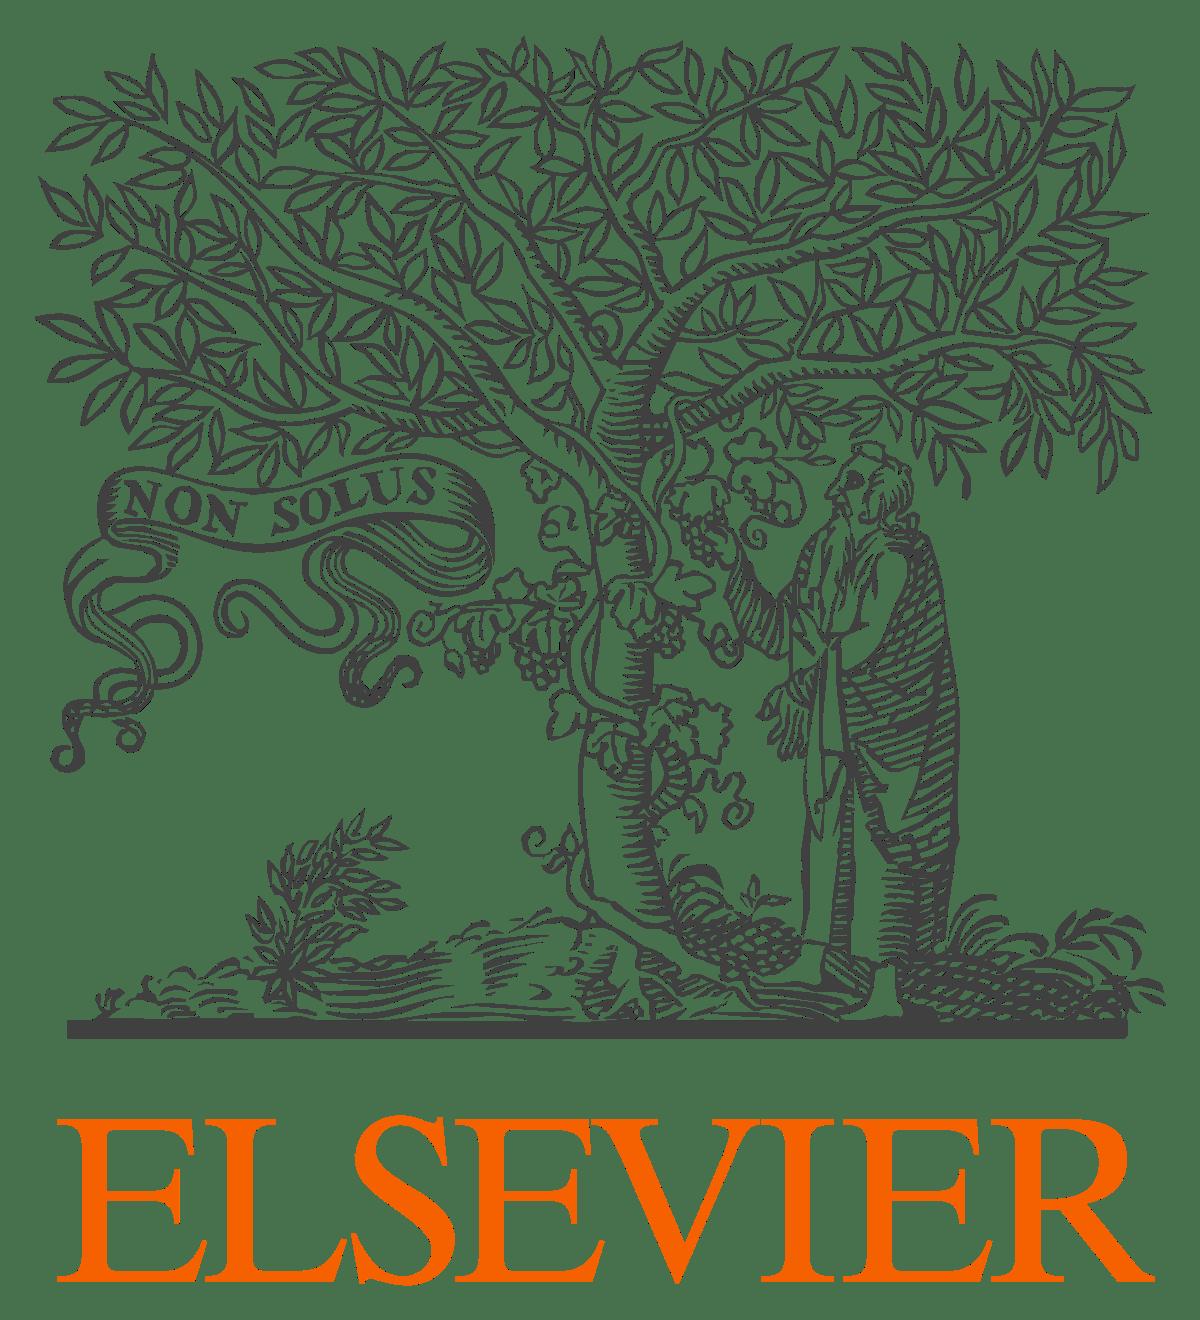 Elsevier - تاریخچه الزویر Elsevier